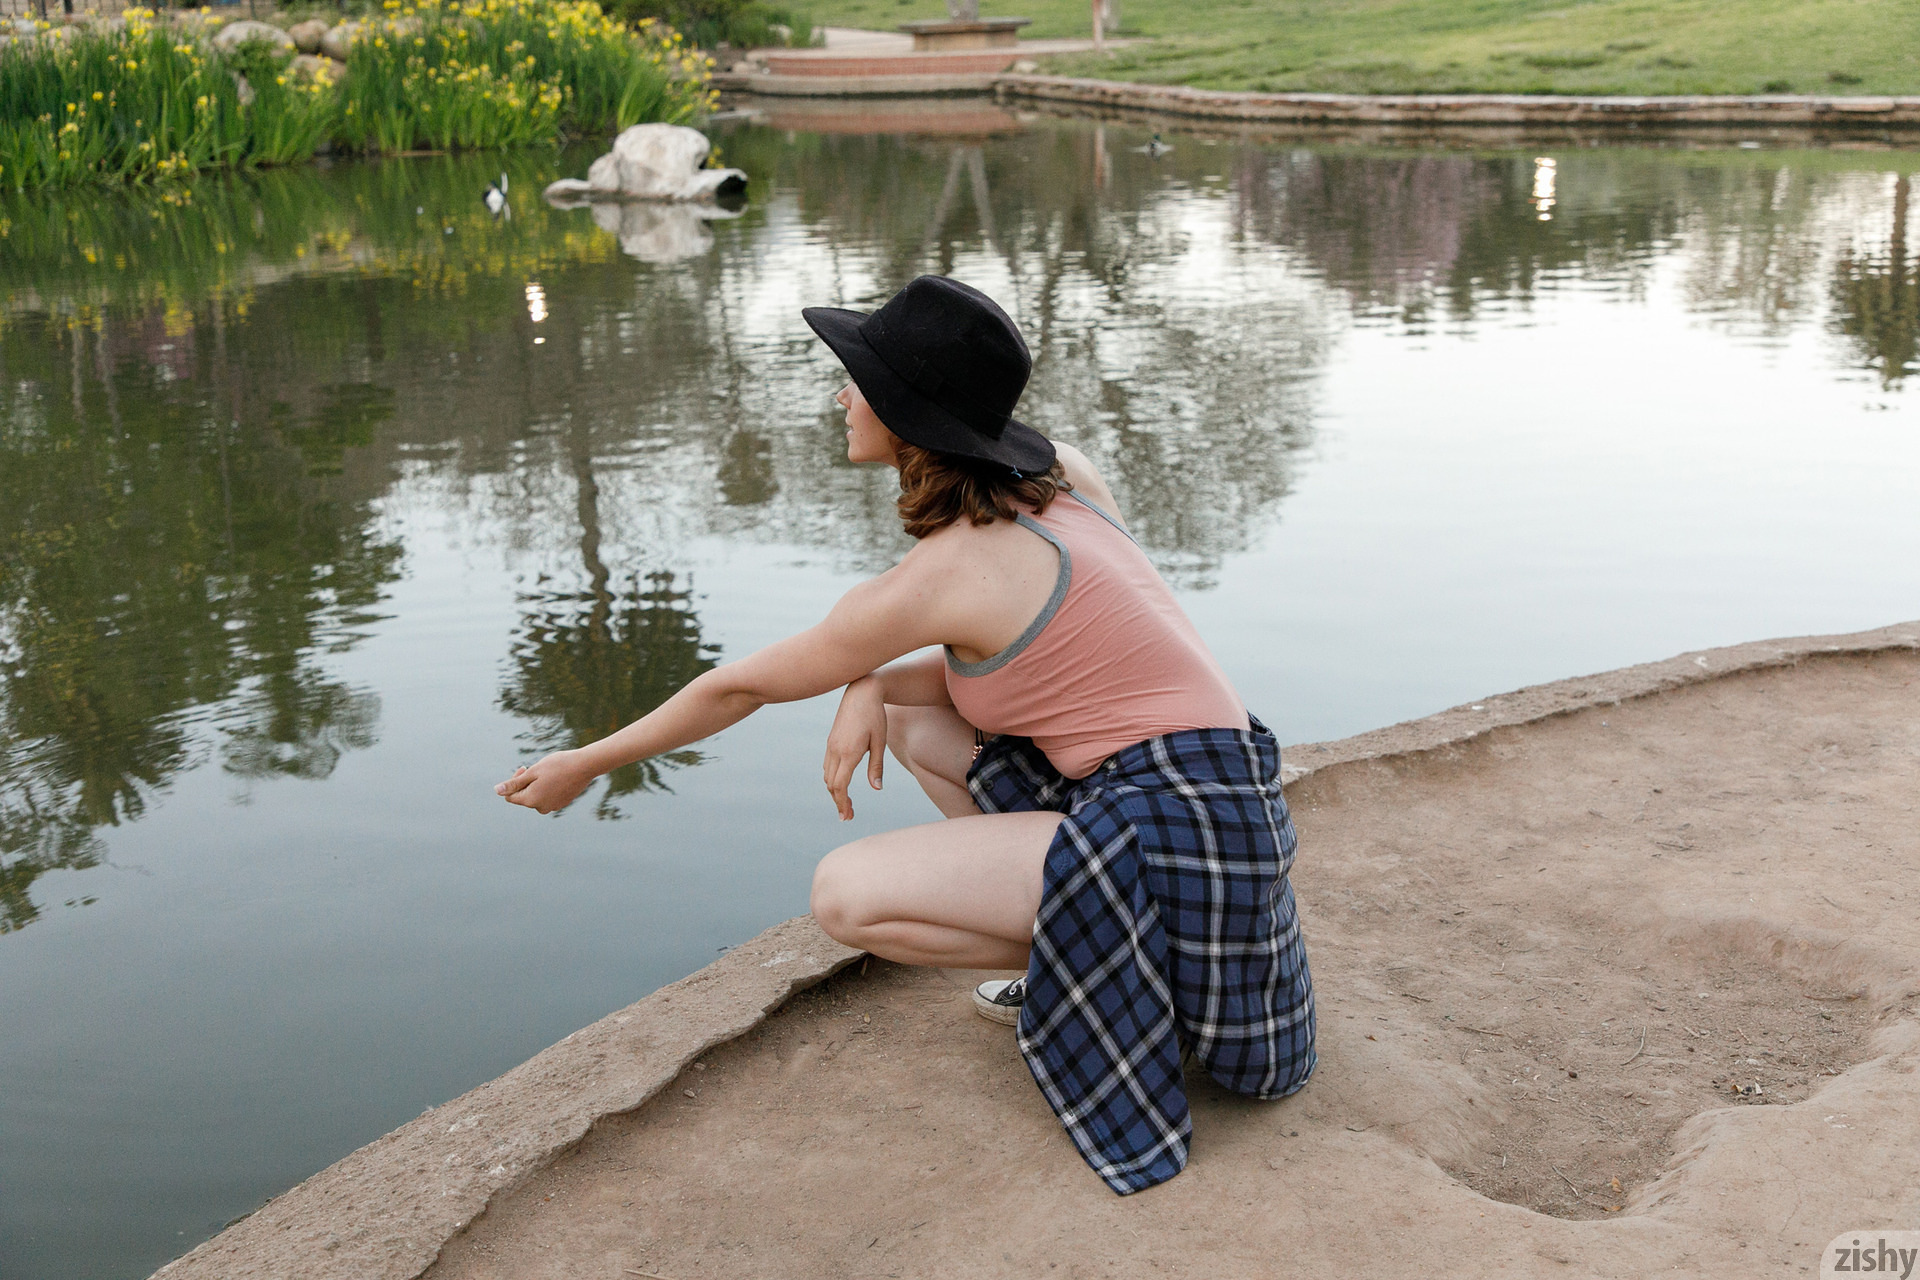 Kayla Coyote Turtles All The Way Down Zishy (12)